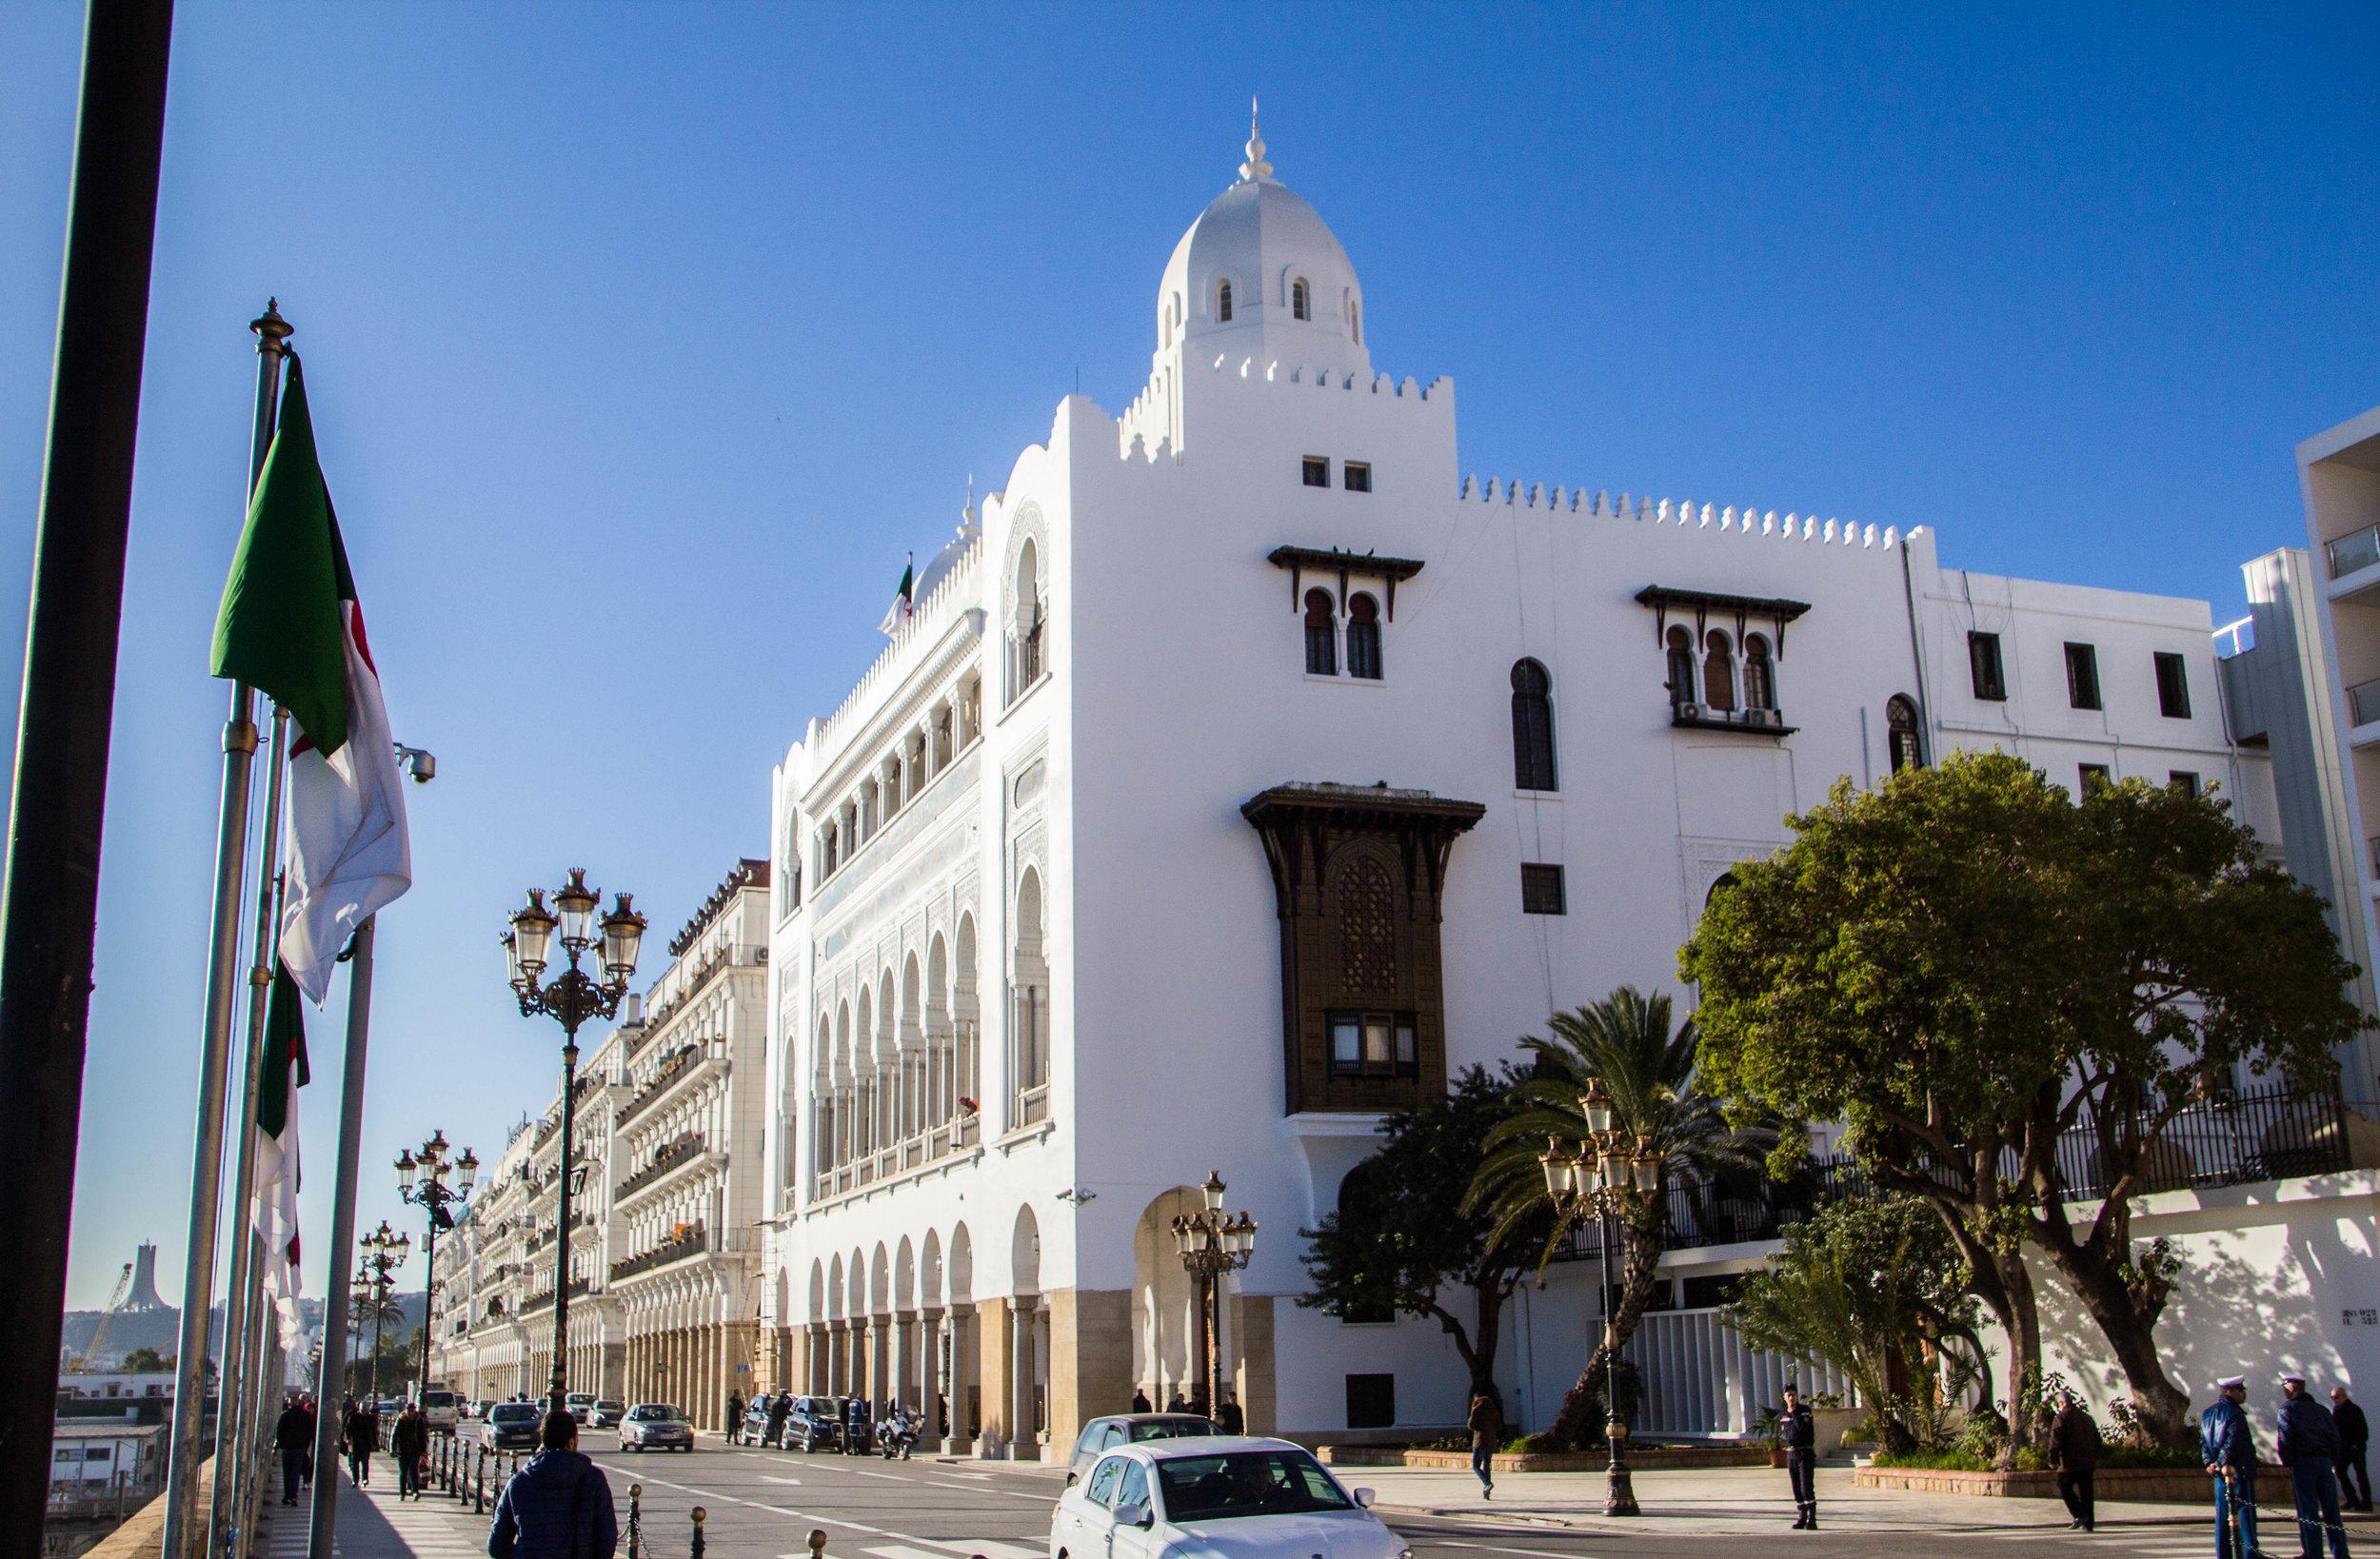 street-photography-algiers-algeria-19.jpg